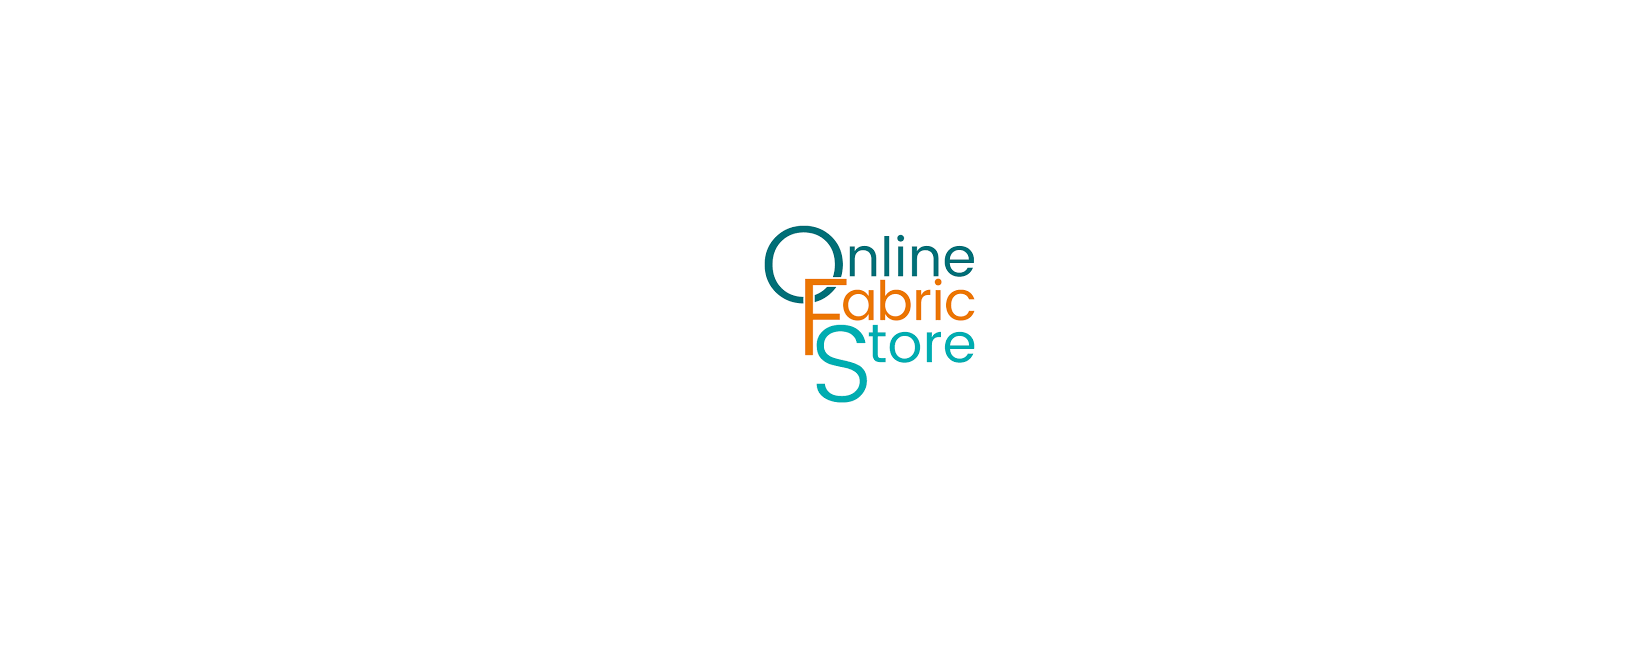 Online Fabric Store Discount Code 2021